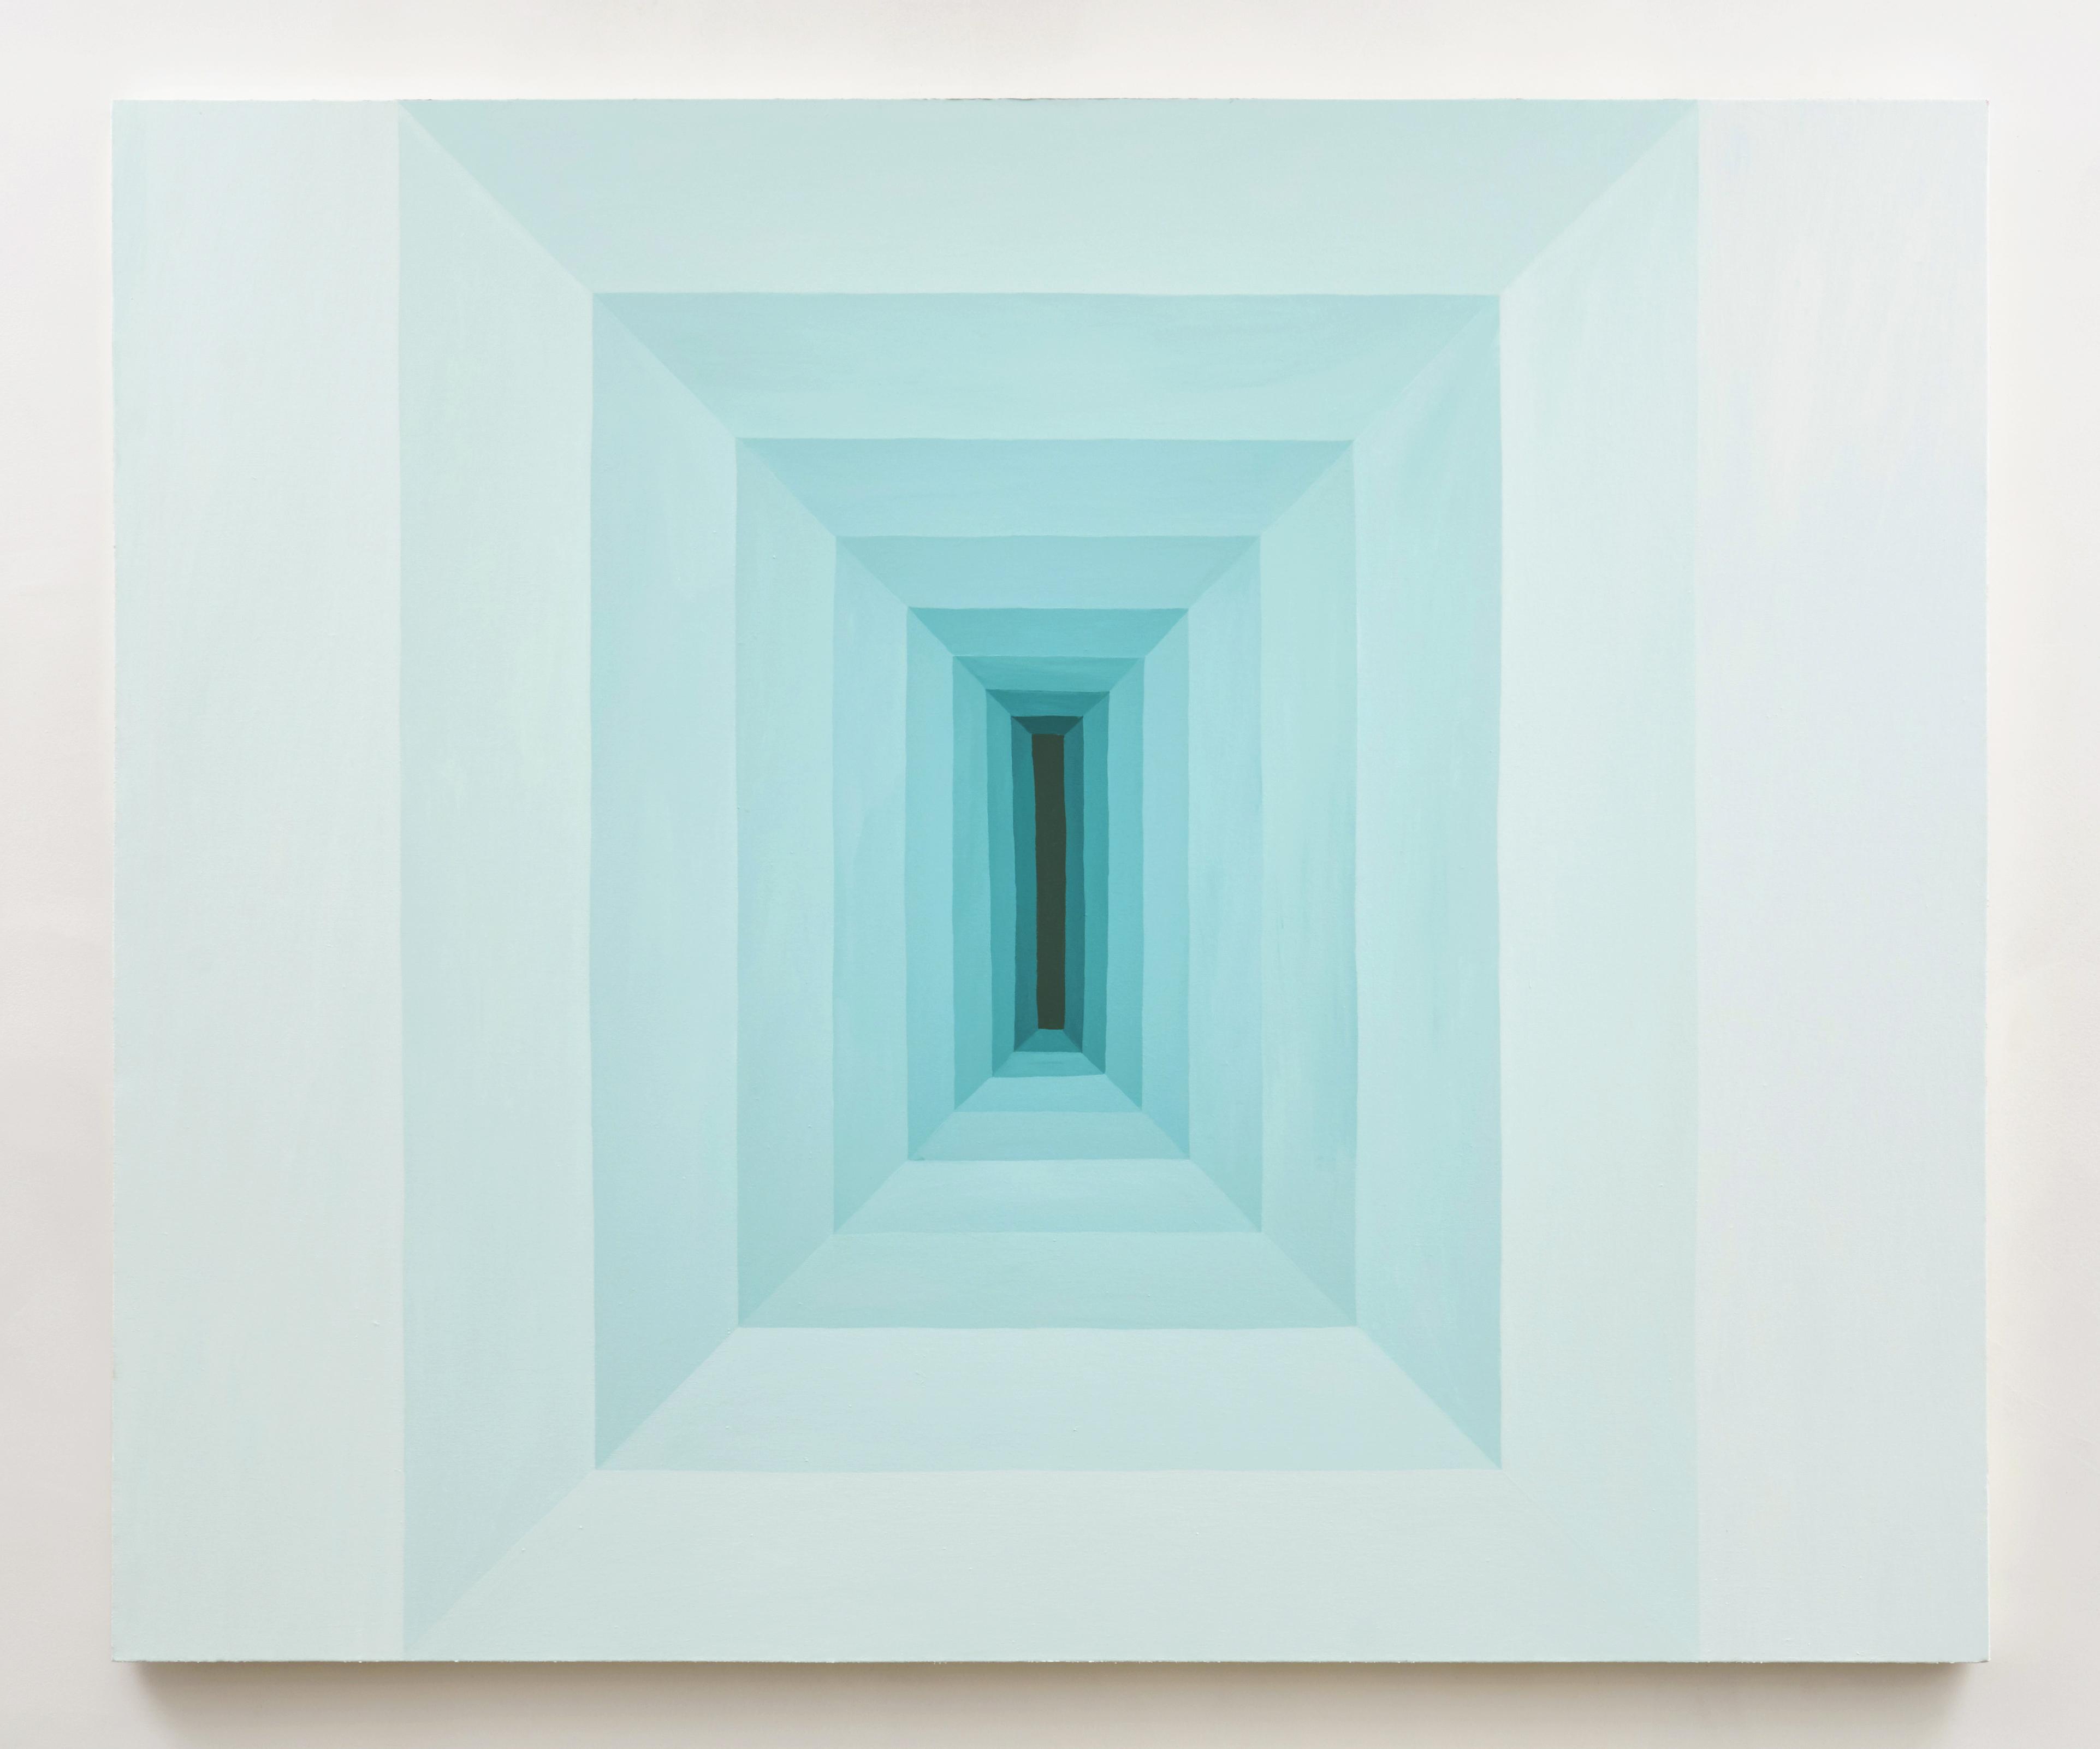 Corydon Cowansage, Hole #14, 2017, 65 x 78 inches, acrylic on canvas. Photo credit: Tyler Kufs